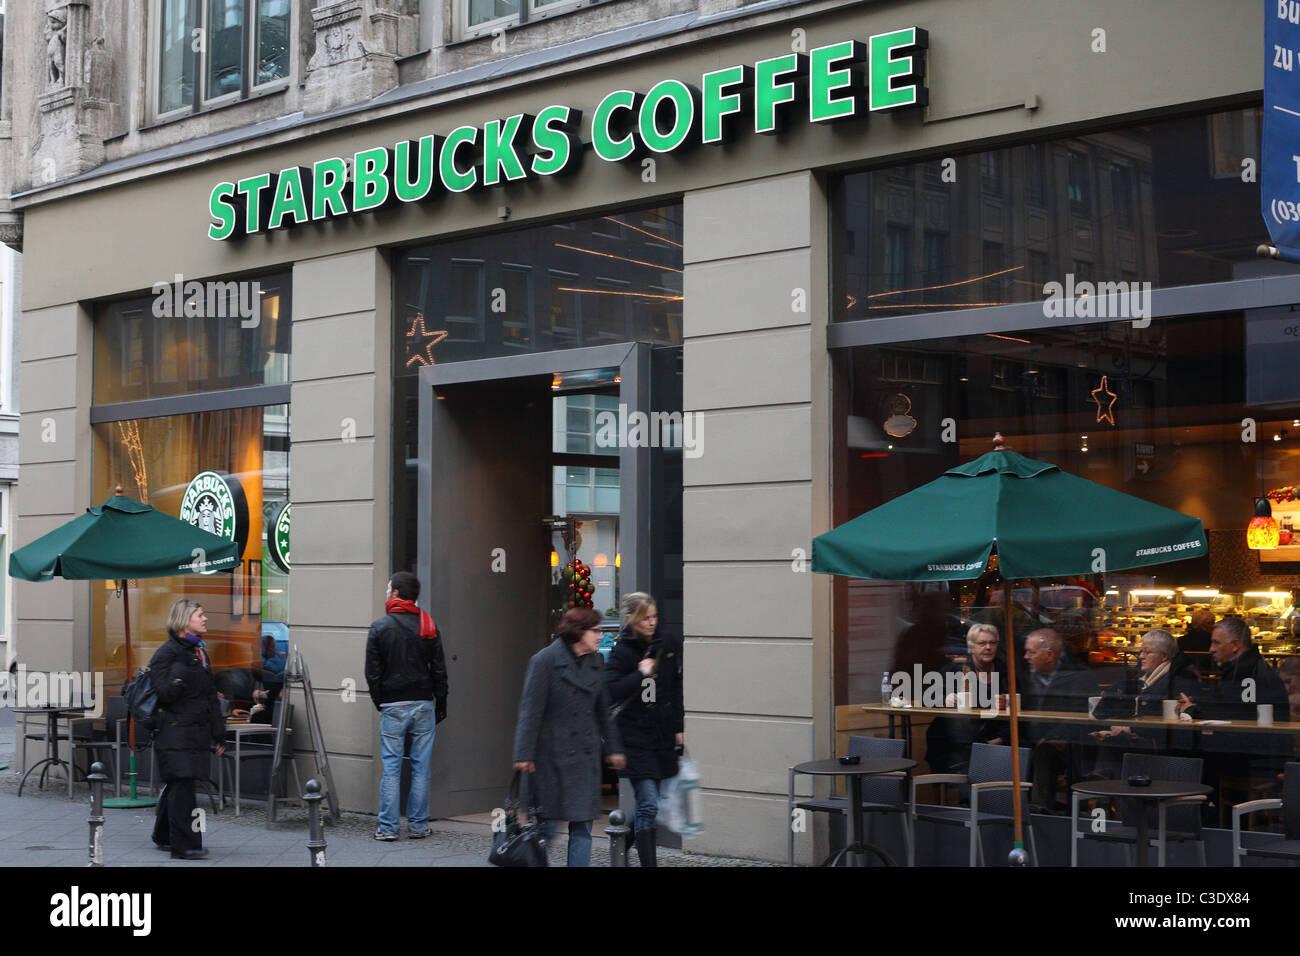 starbucks coffee shop berlin germany stock photo royalty free image 36570692 alamy. Black Bedroom Furniture Sets. Home Design Ideas